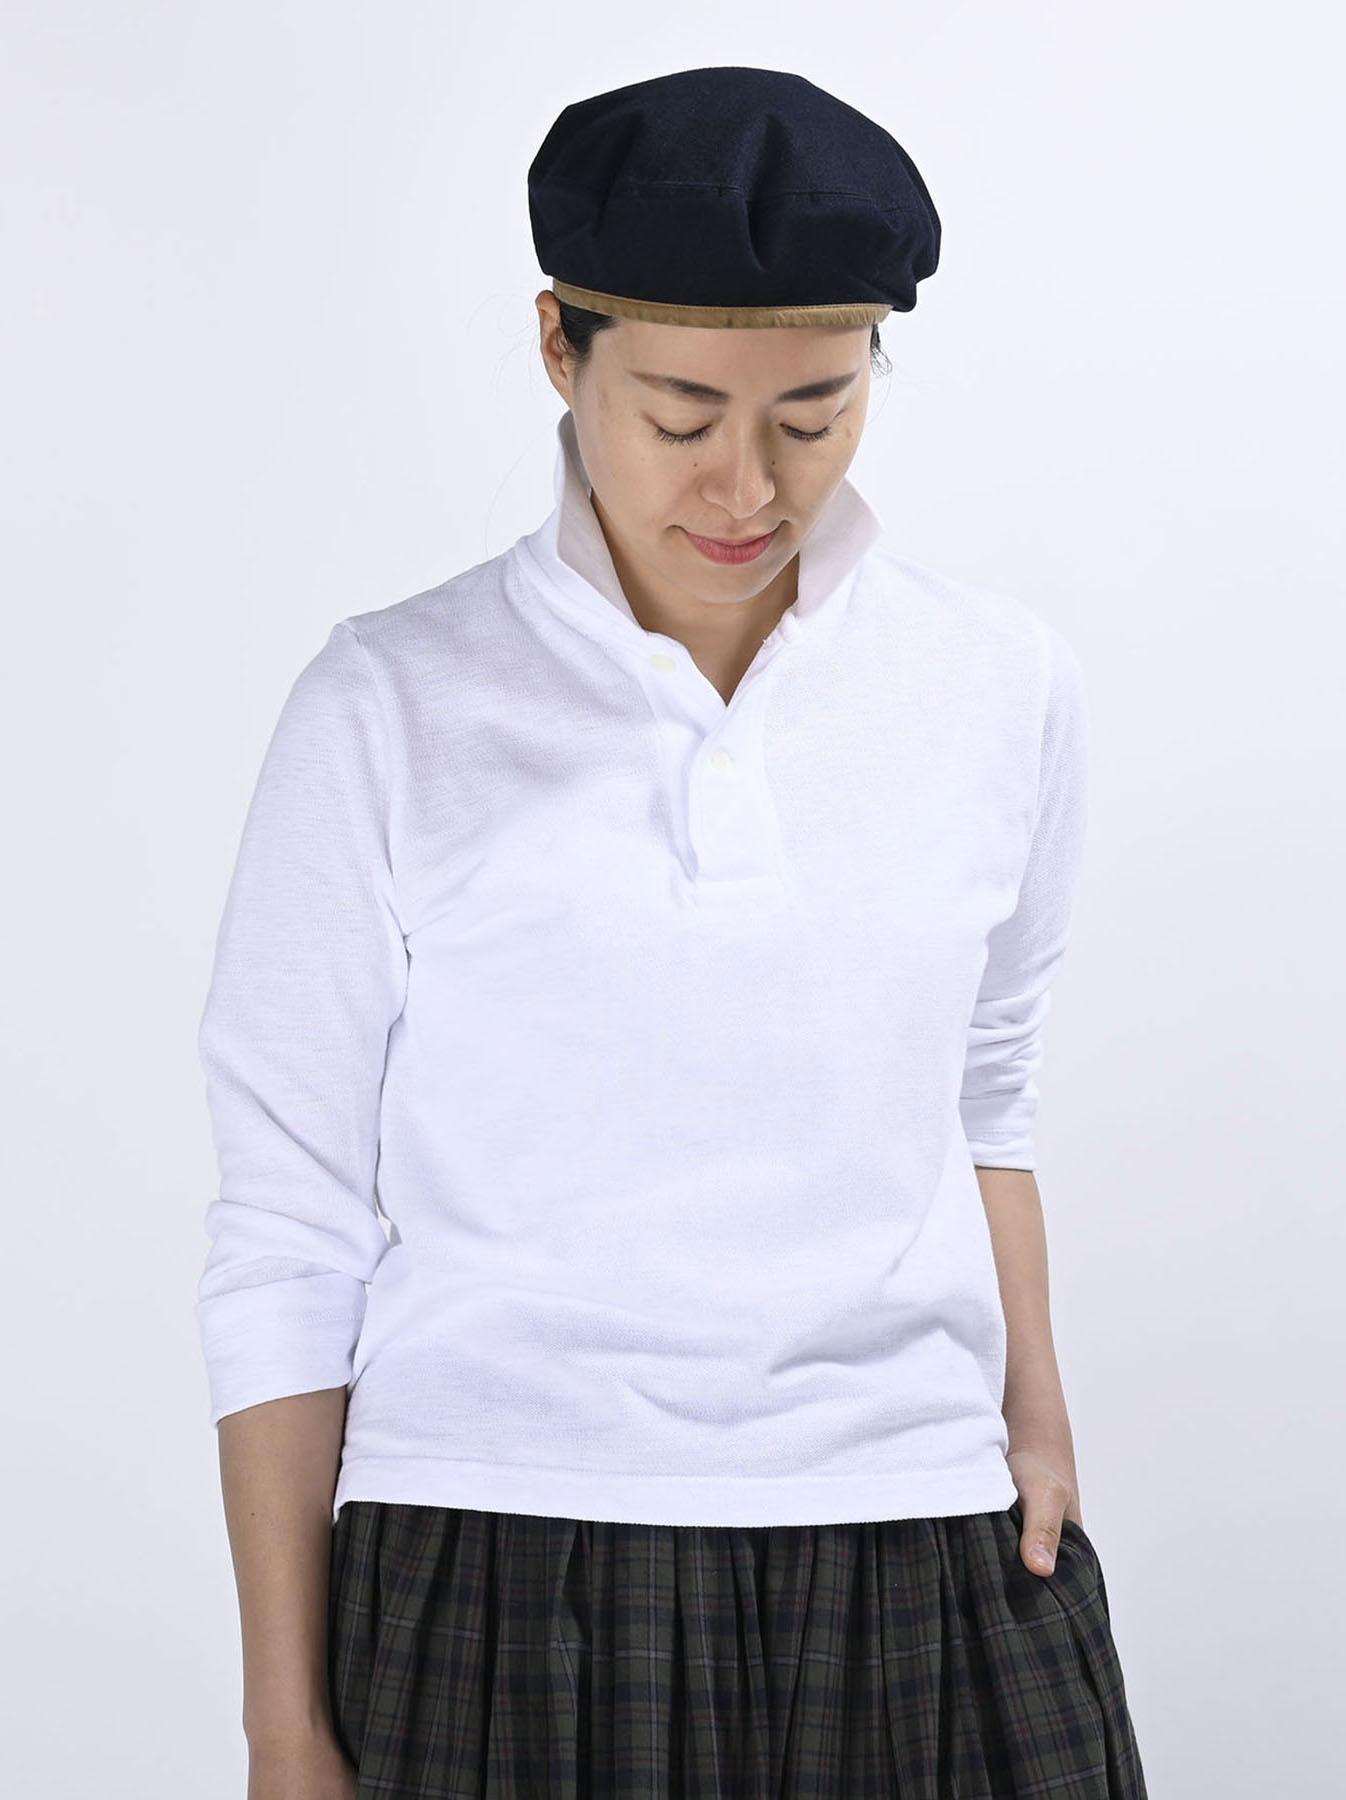 Kanoko Shiokaze Long-sleeved Square Polo Shirt (0521)-3